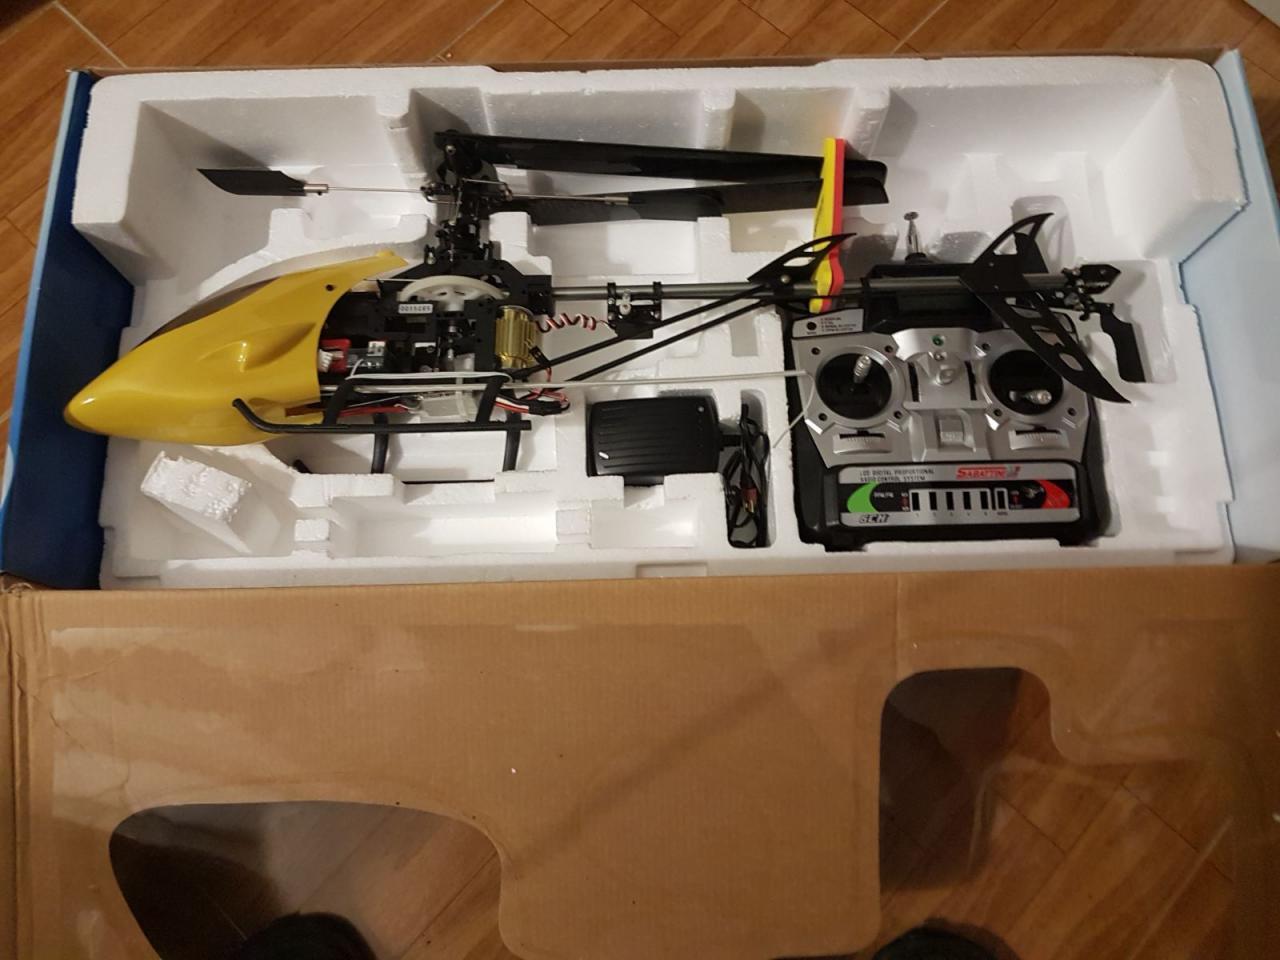 Elicottero 450 : Elicottero 450 eagle 3d baronerosso.it forum modellismo